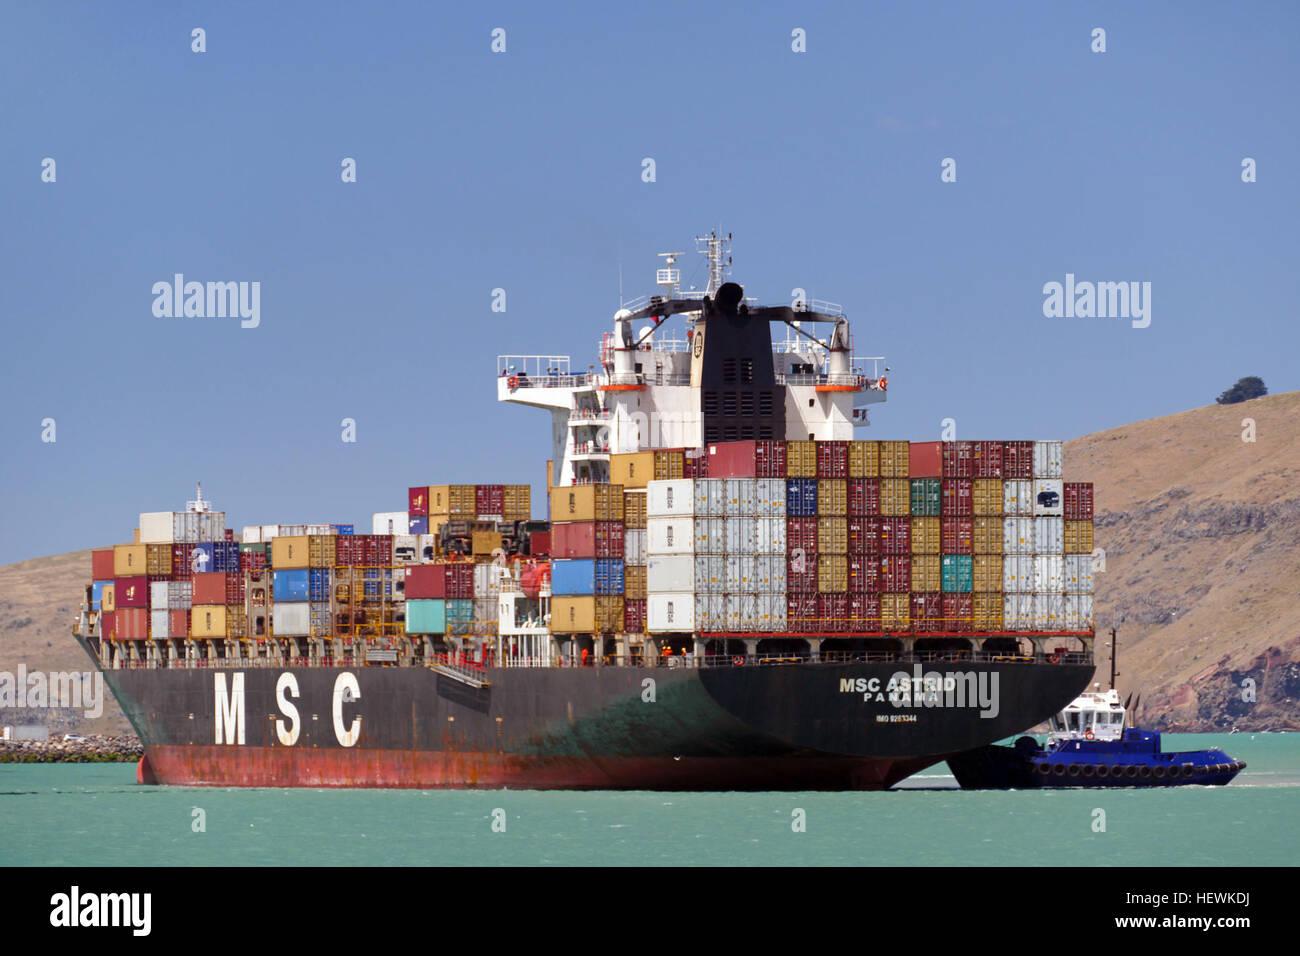 IMO: 9433054 MMSI: 209828000 Call Sign: 5BTH3 Flag: Cyprus [CY] AIS Vessel Type: Cargo - Hazard A (Major) Gross - Stock Image